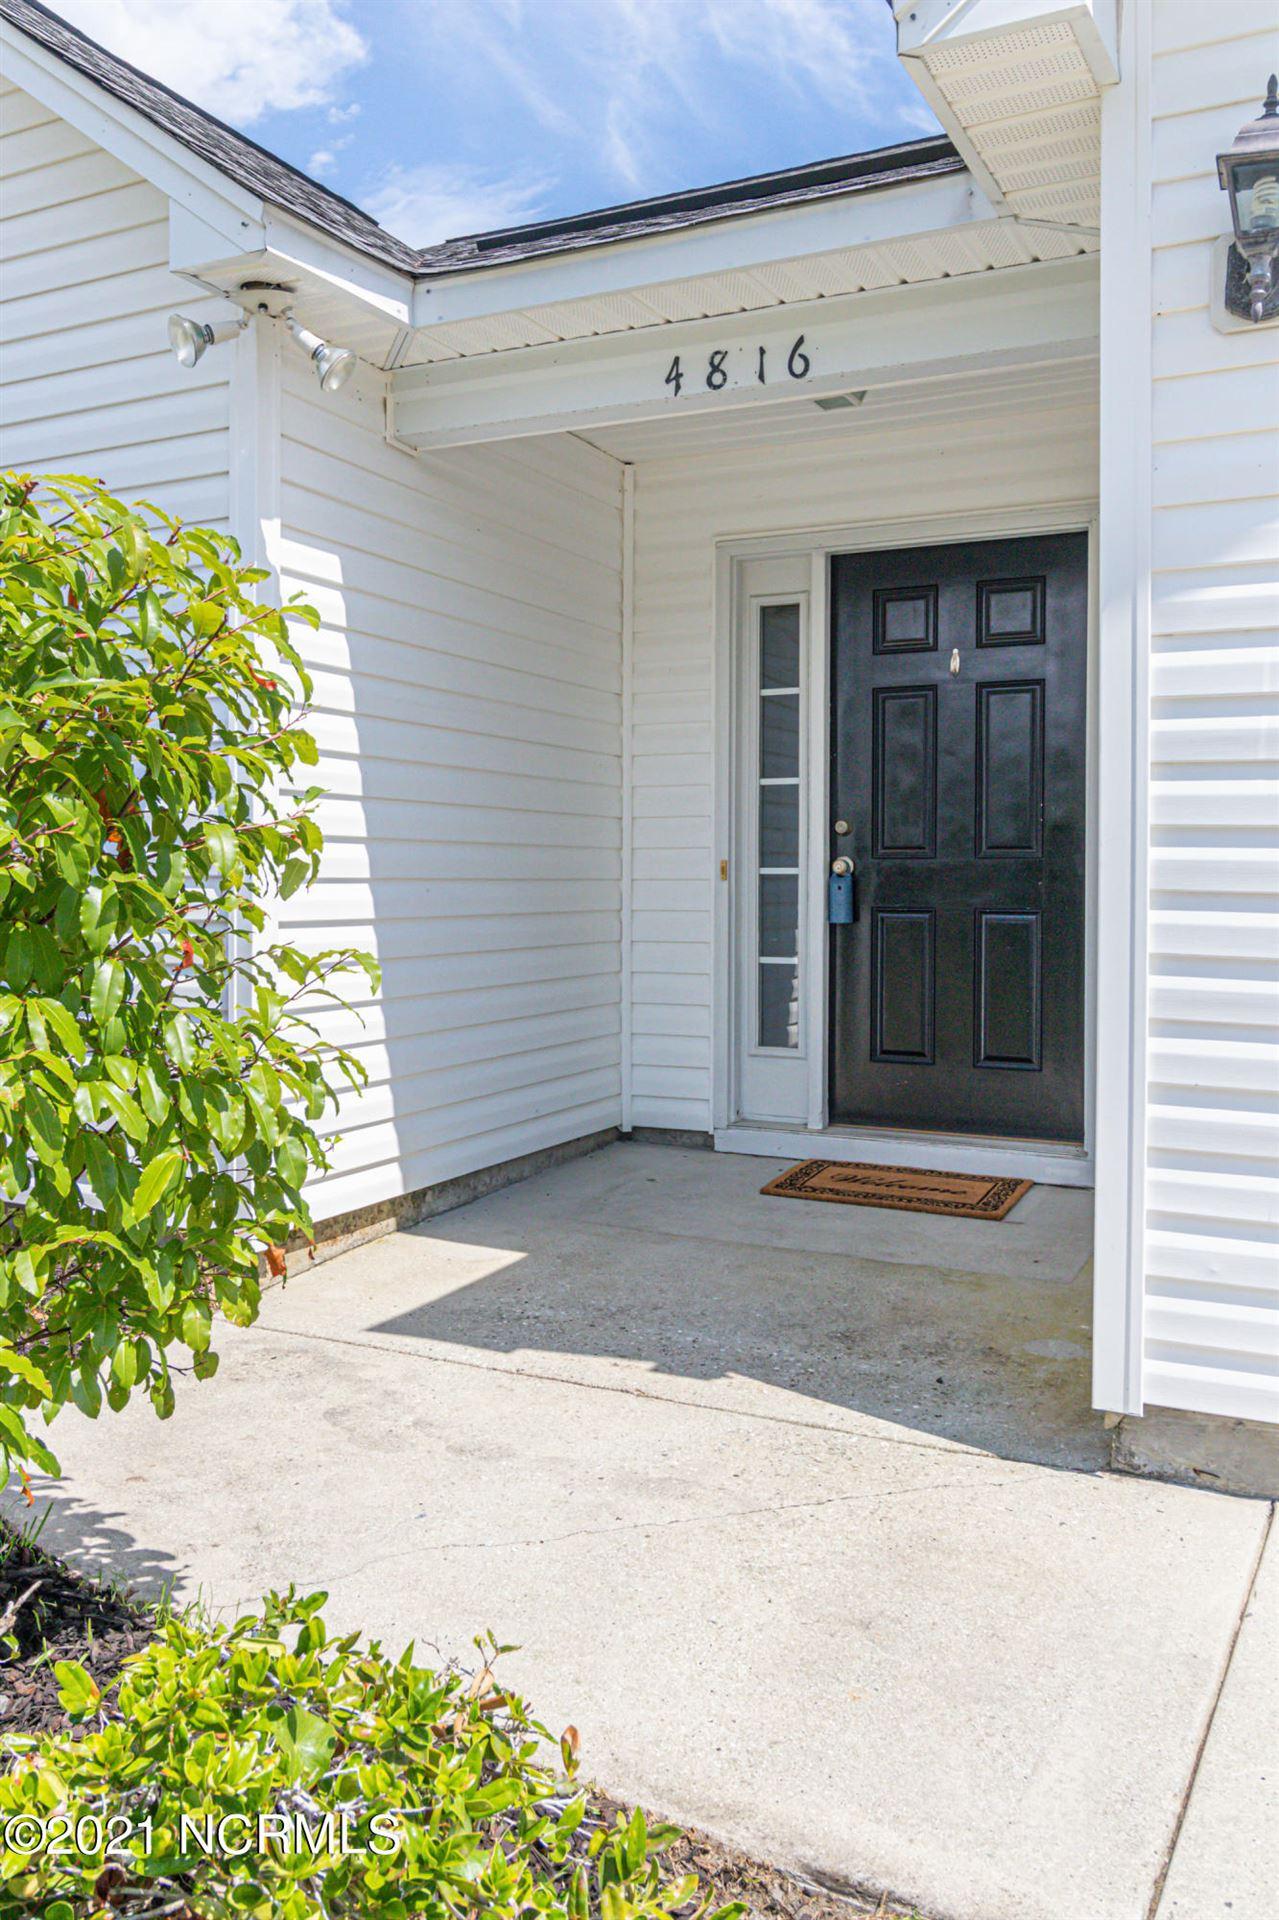 Photo of 4816 Beech Tree Drive SE, Southport, NC 28461 (MLS # 100287367)